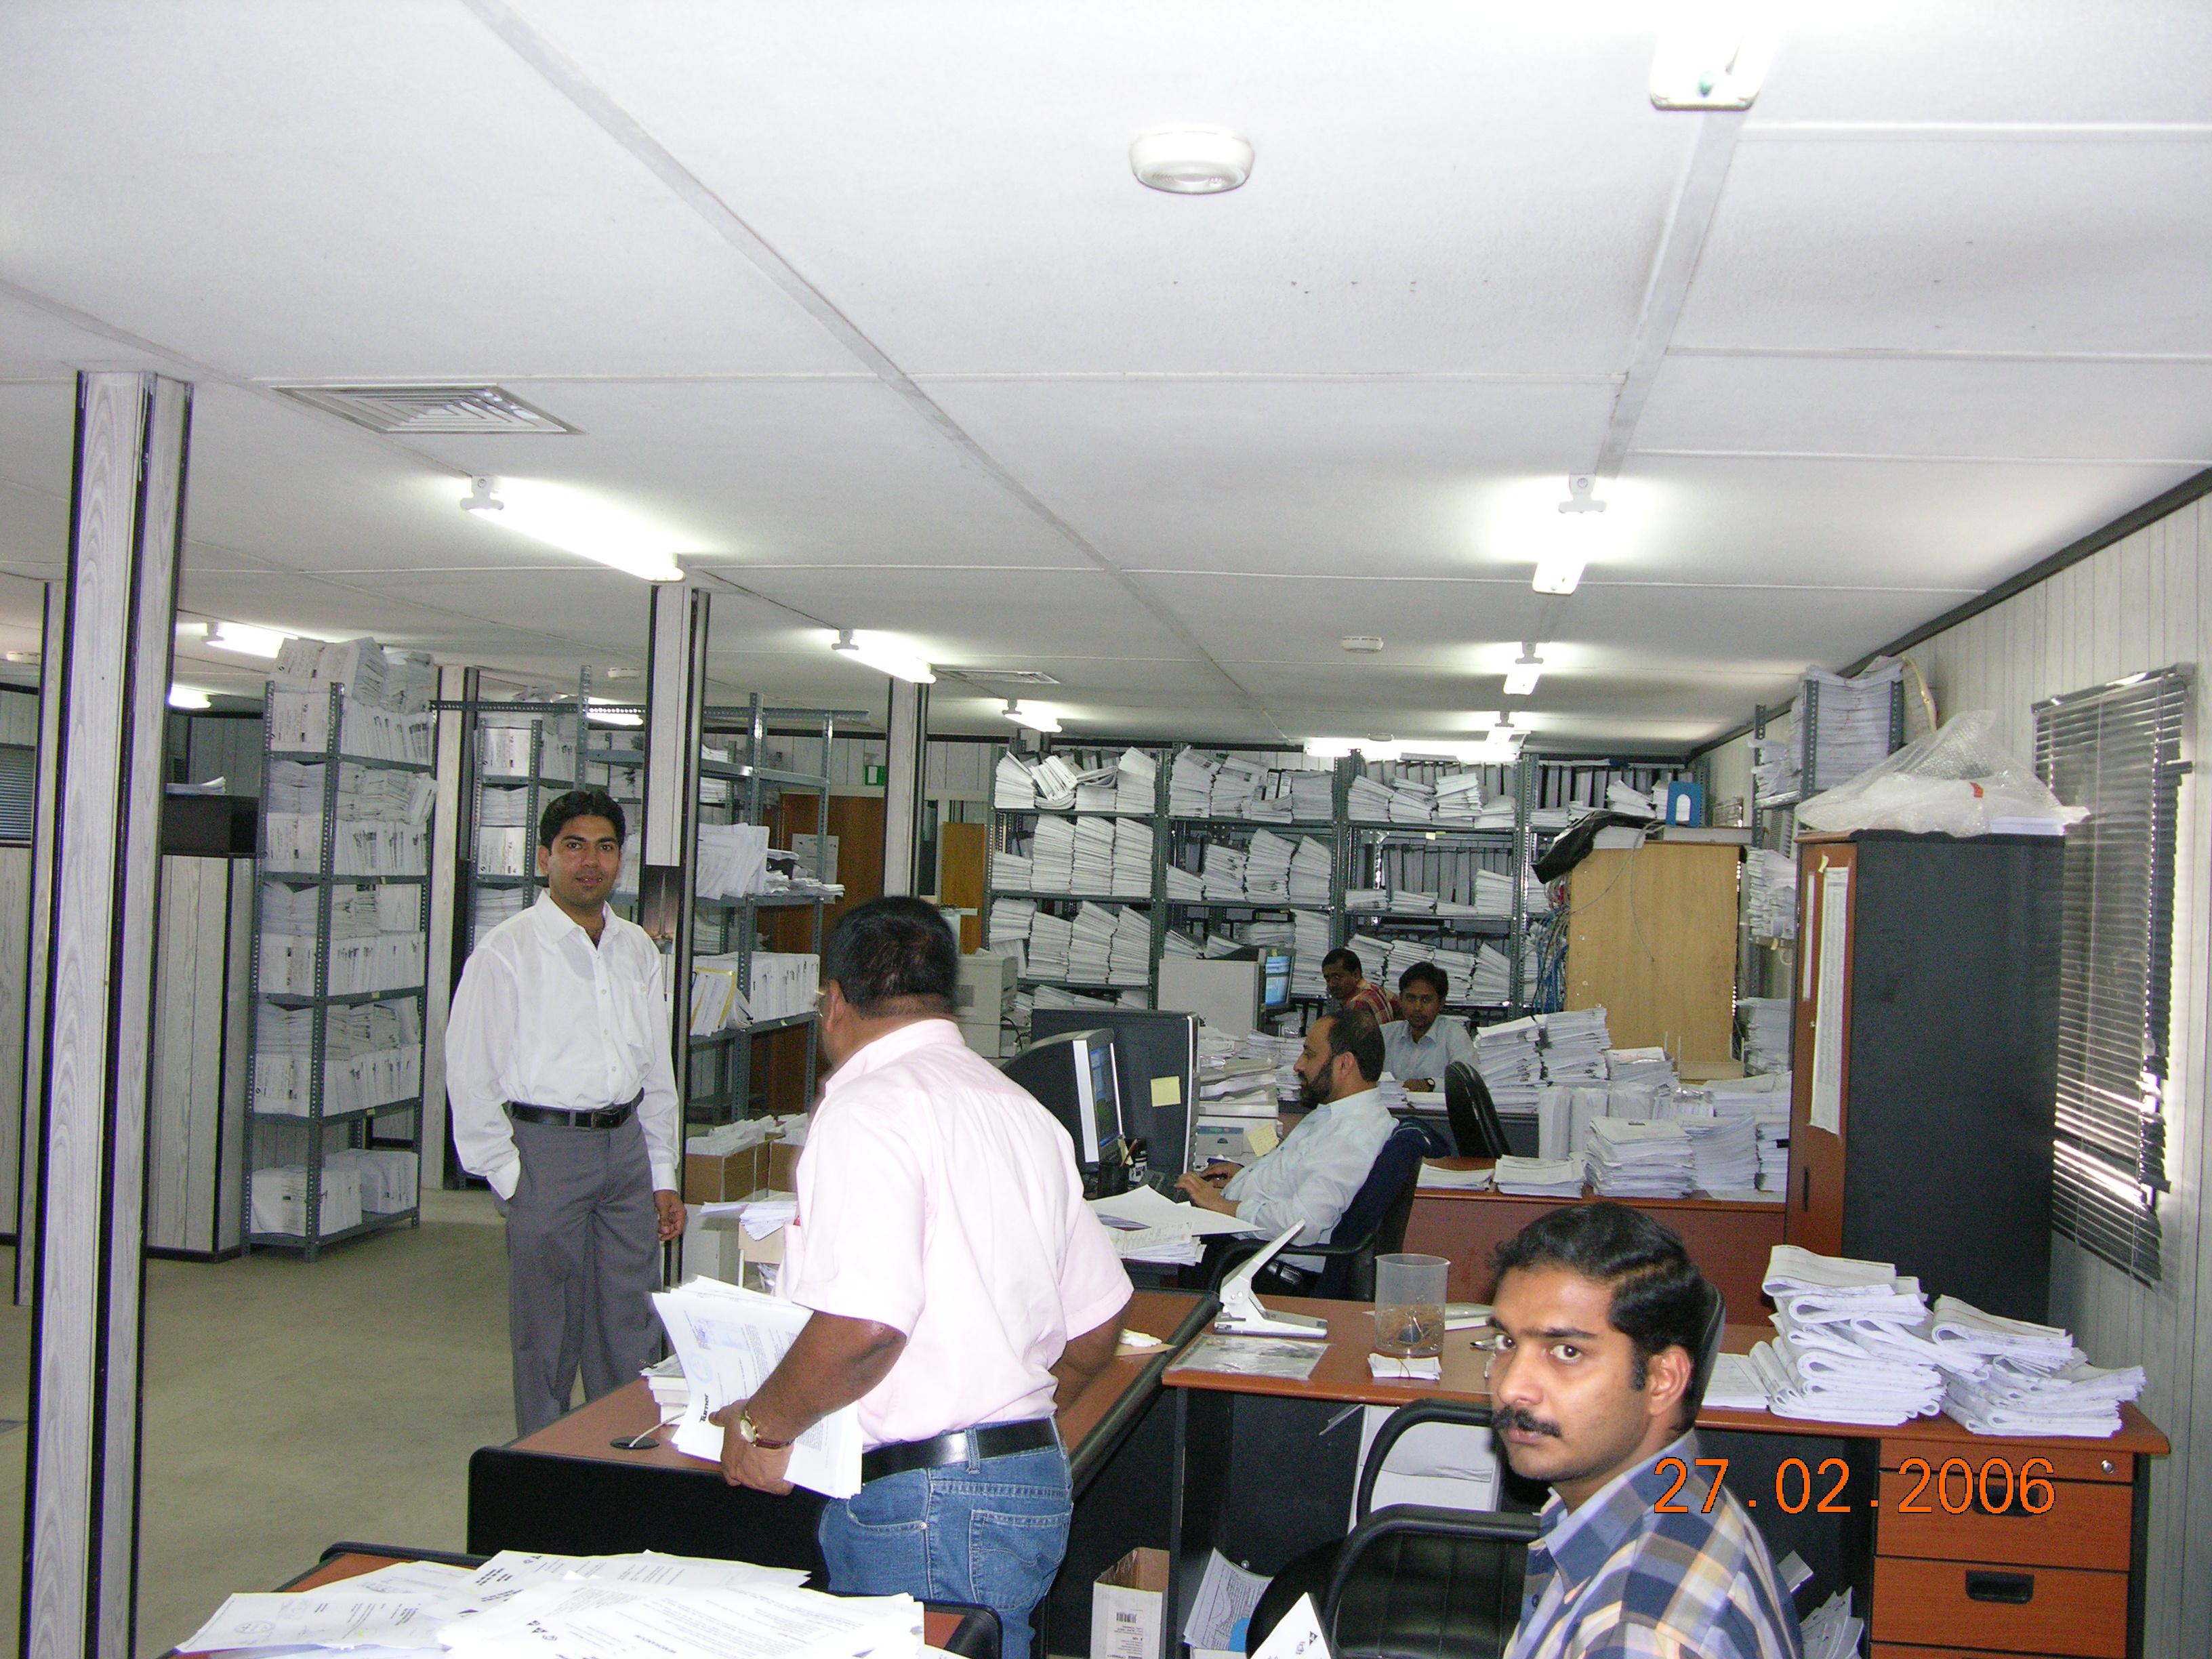 Dubai mall document control team in action